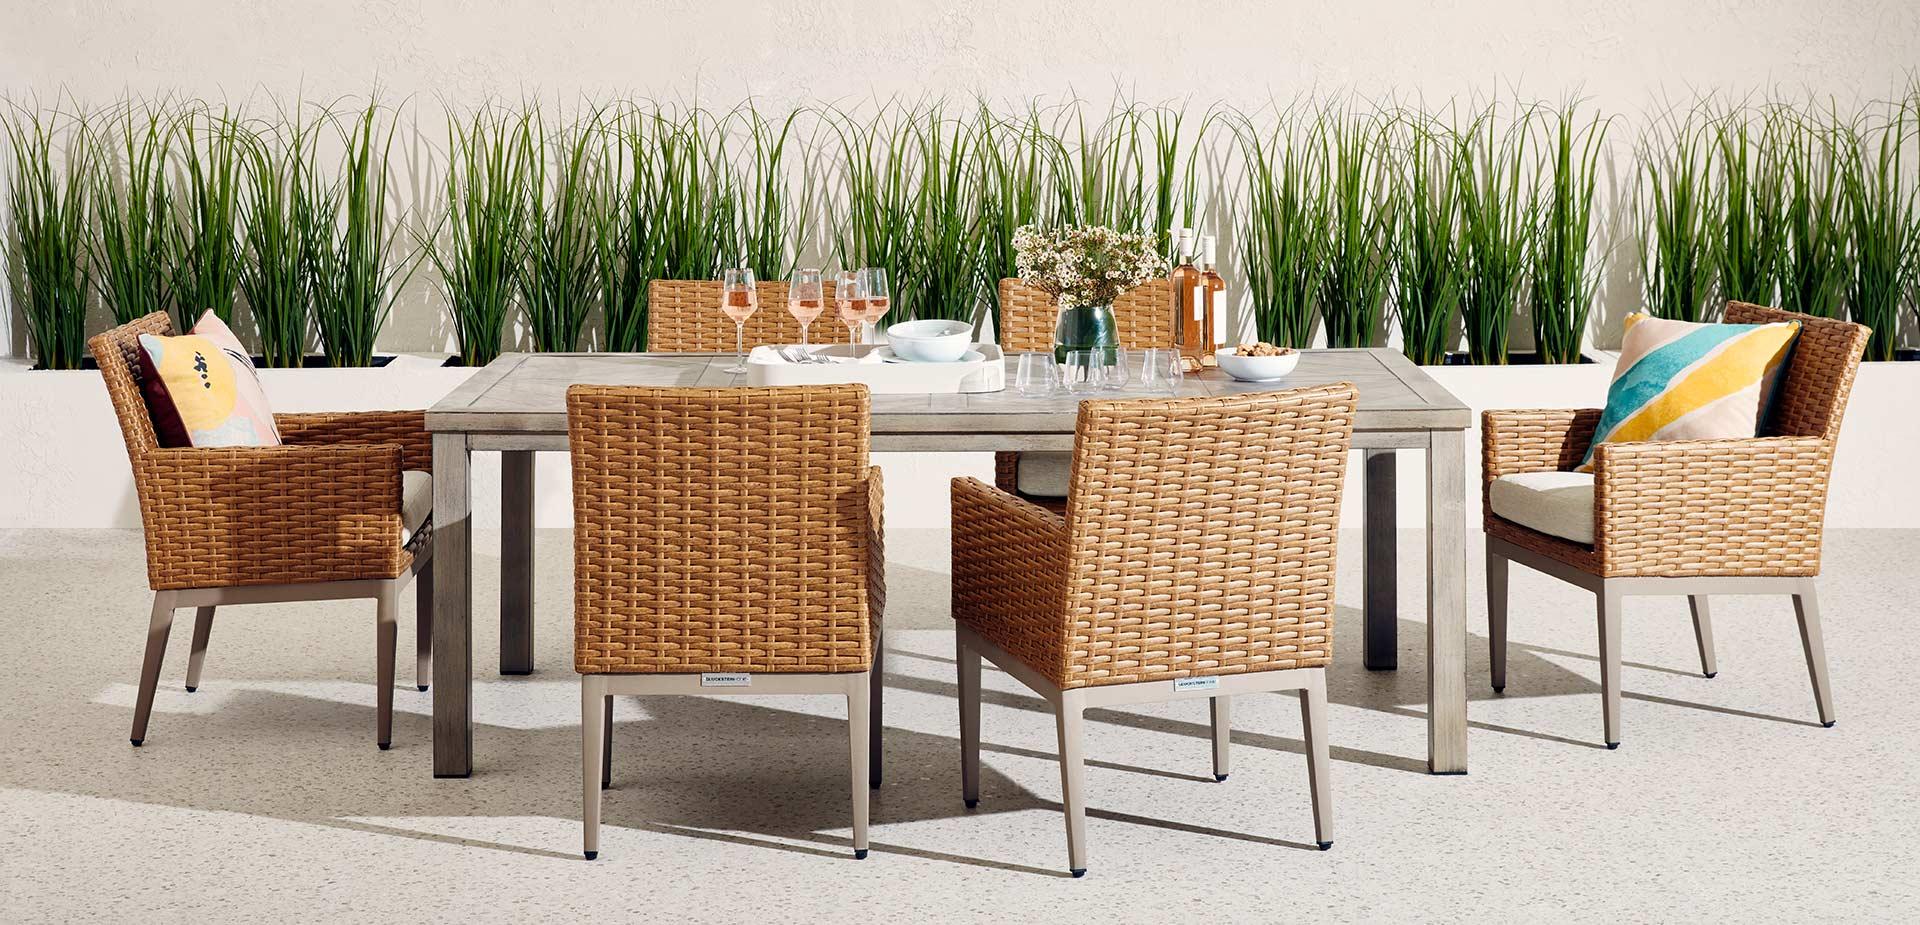 GlucksteinHome | Sedona Dining Set in Natural